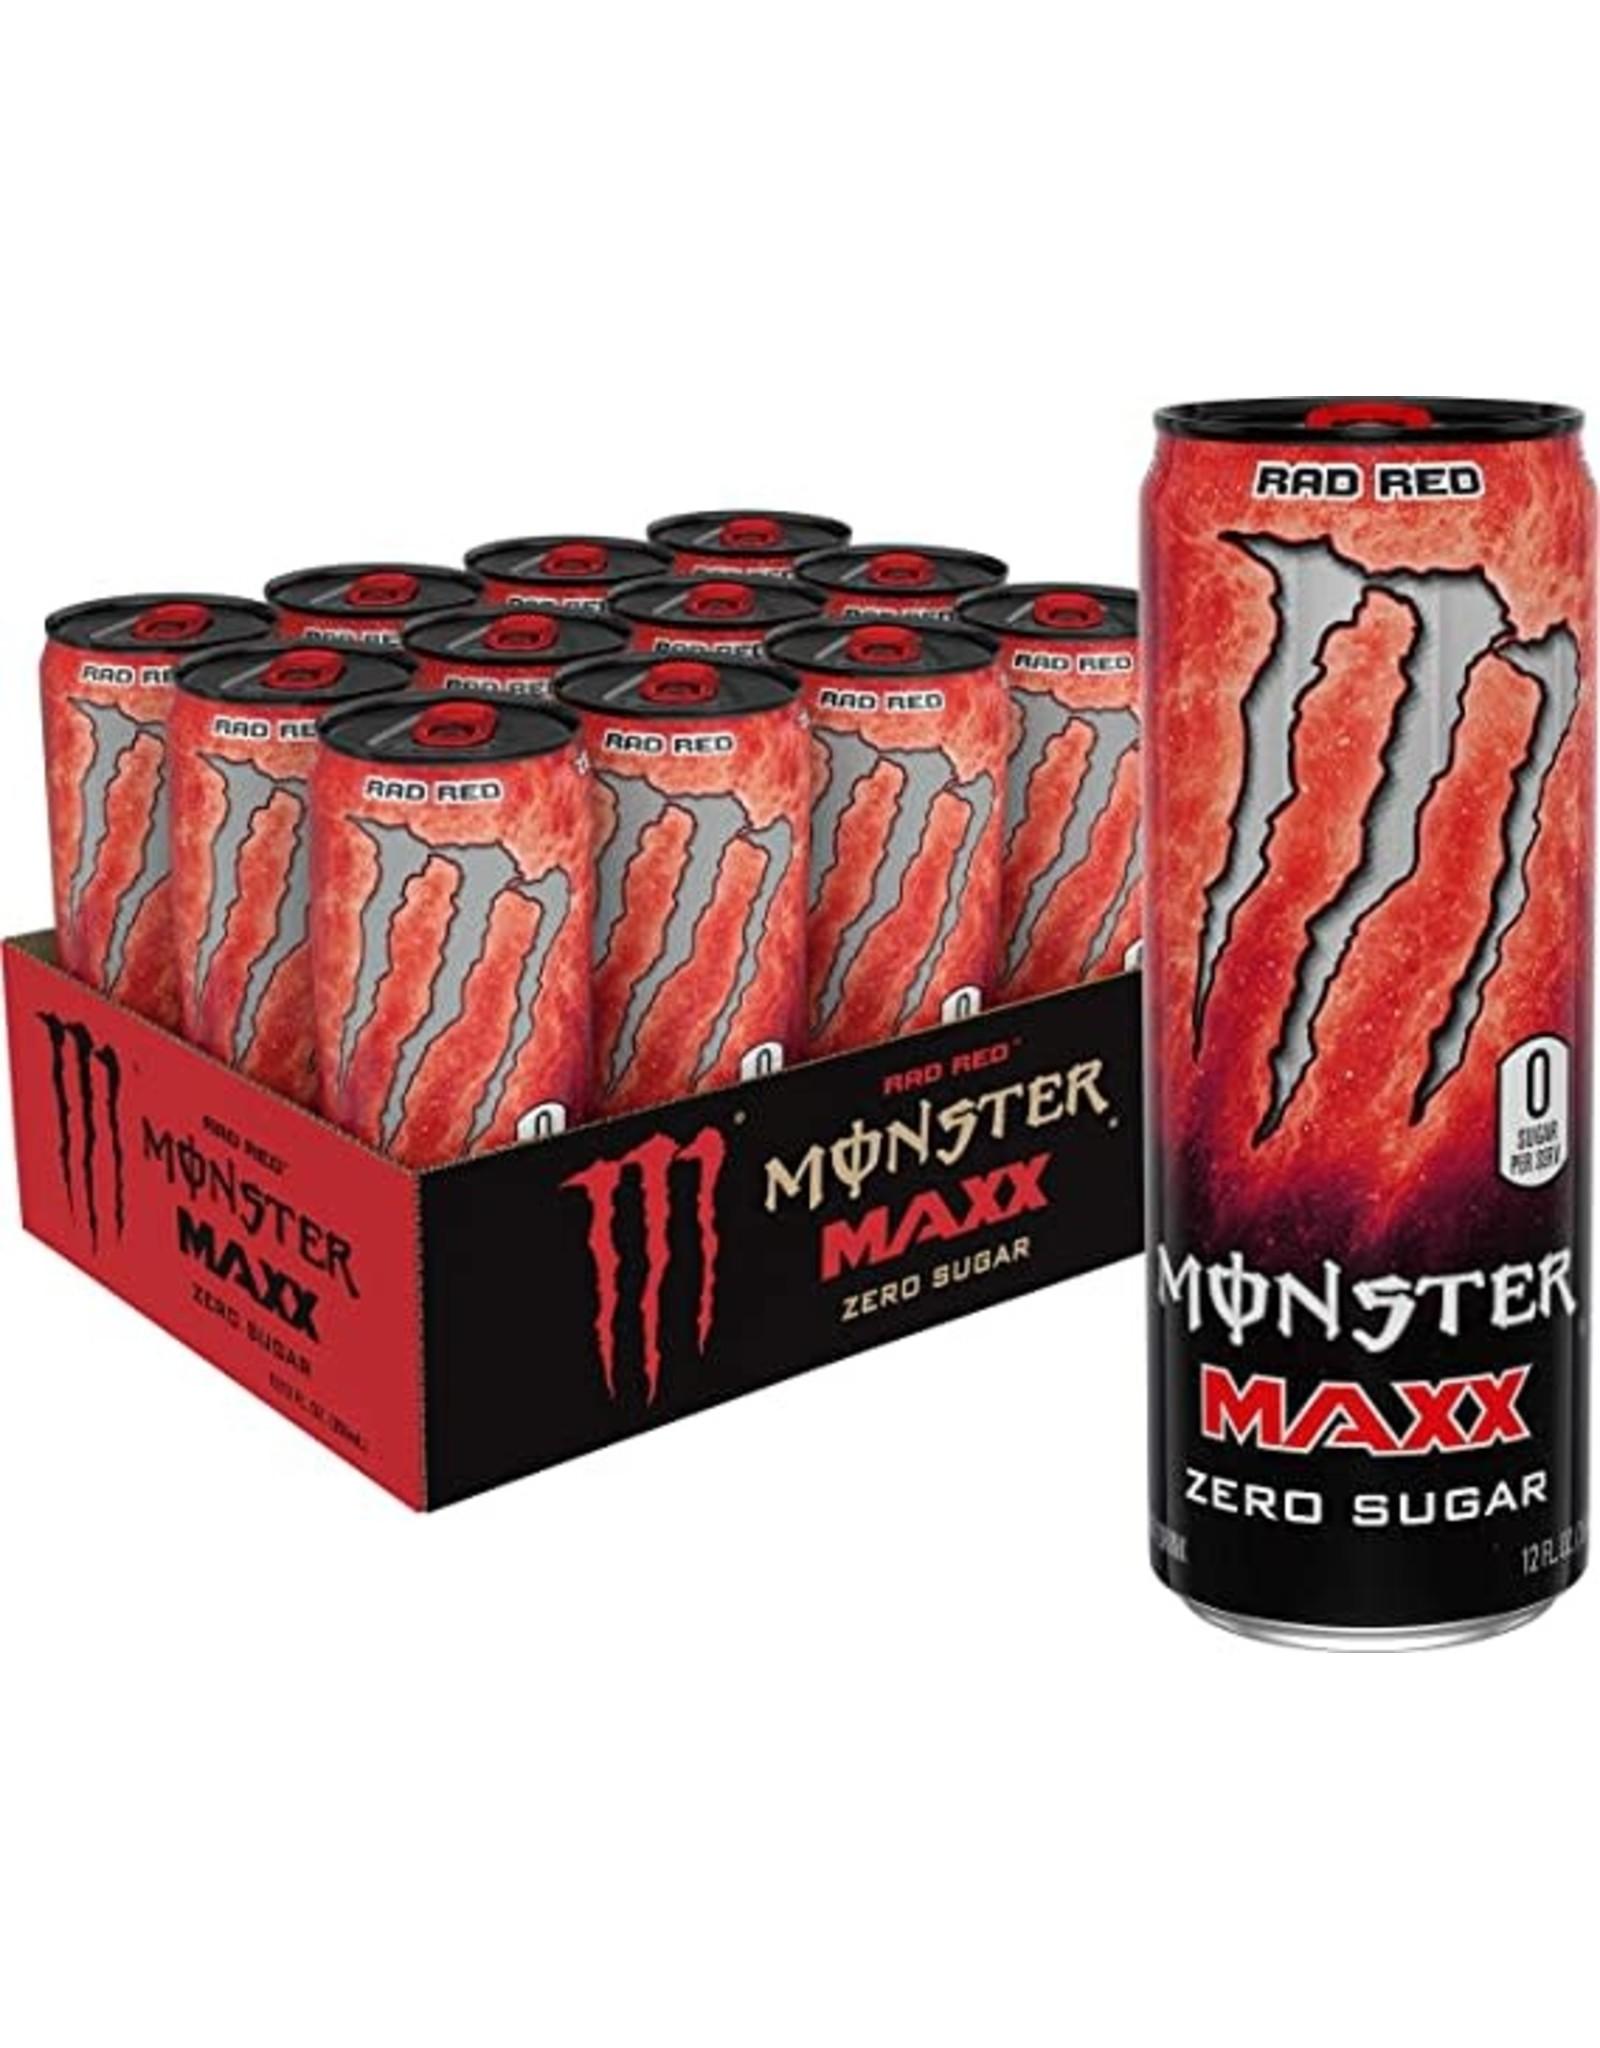 Monster Maxx Rad Red (import) - Zero Sugar - 355 ml